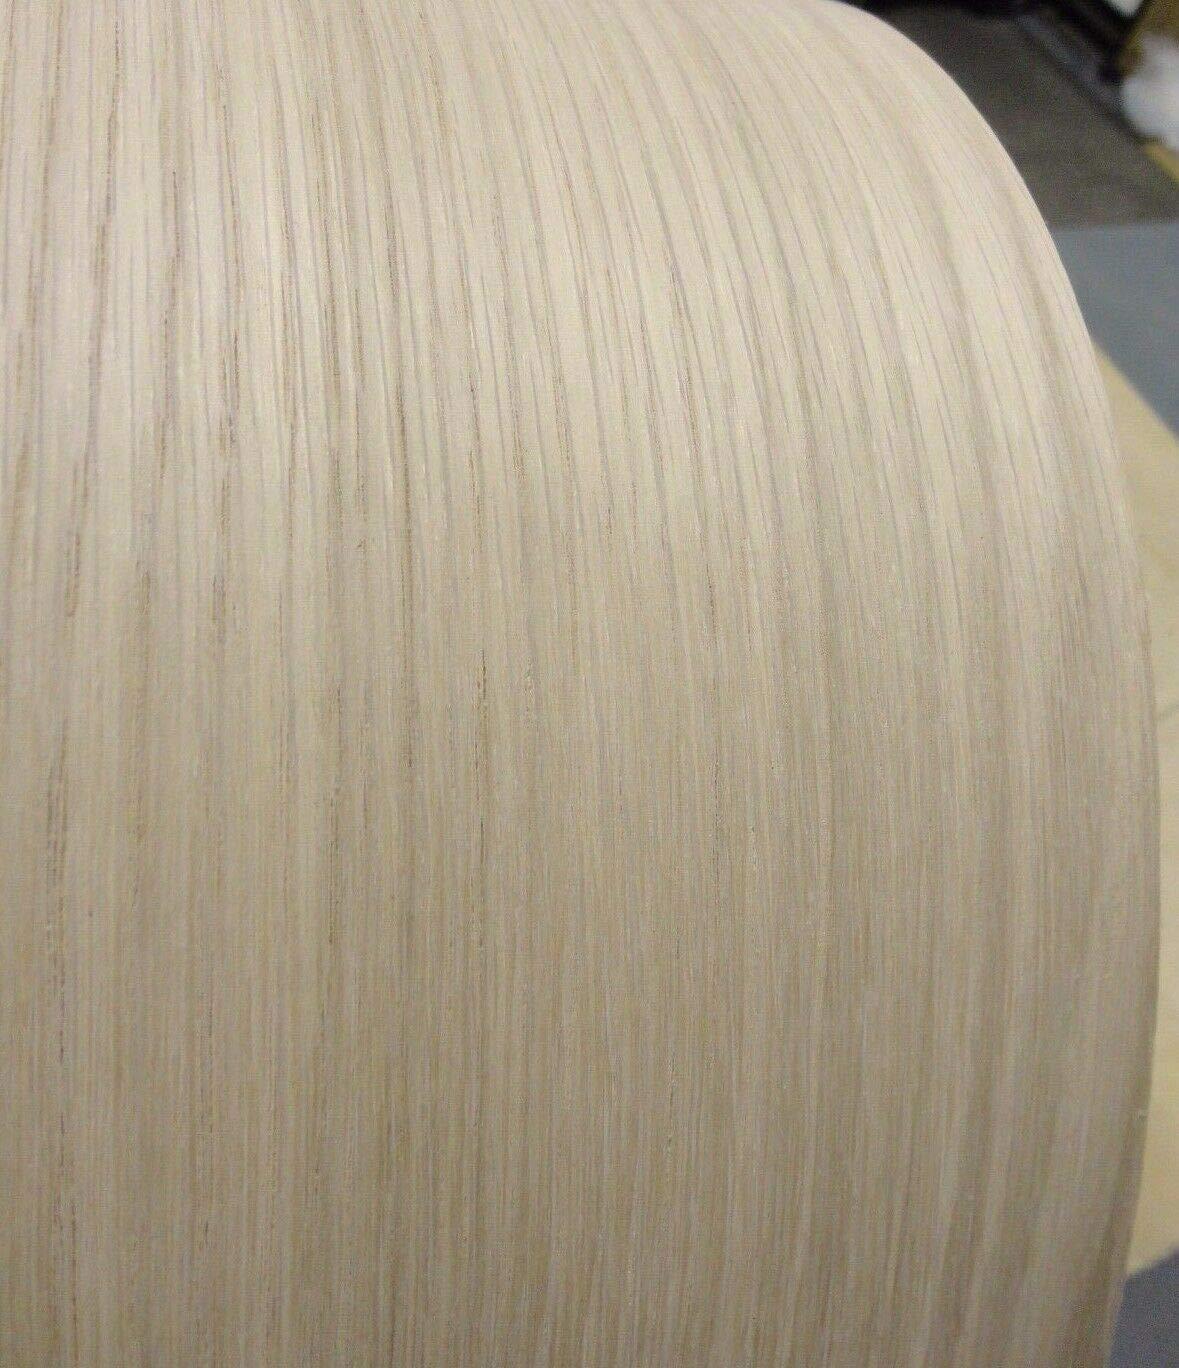 White Oak wood veneer edgebanding 6'' x 120'' with preglued hot melt adhesive by JSO Wood Products